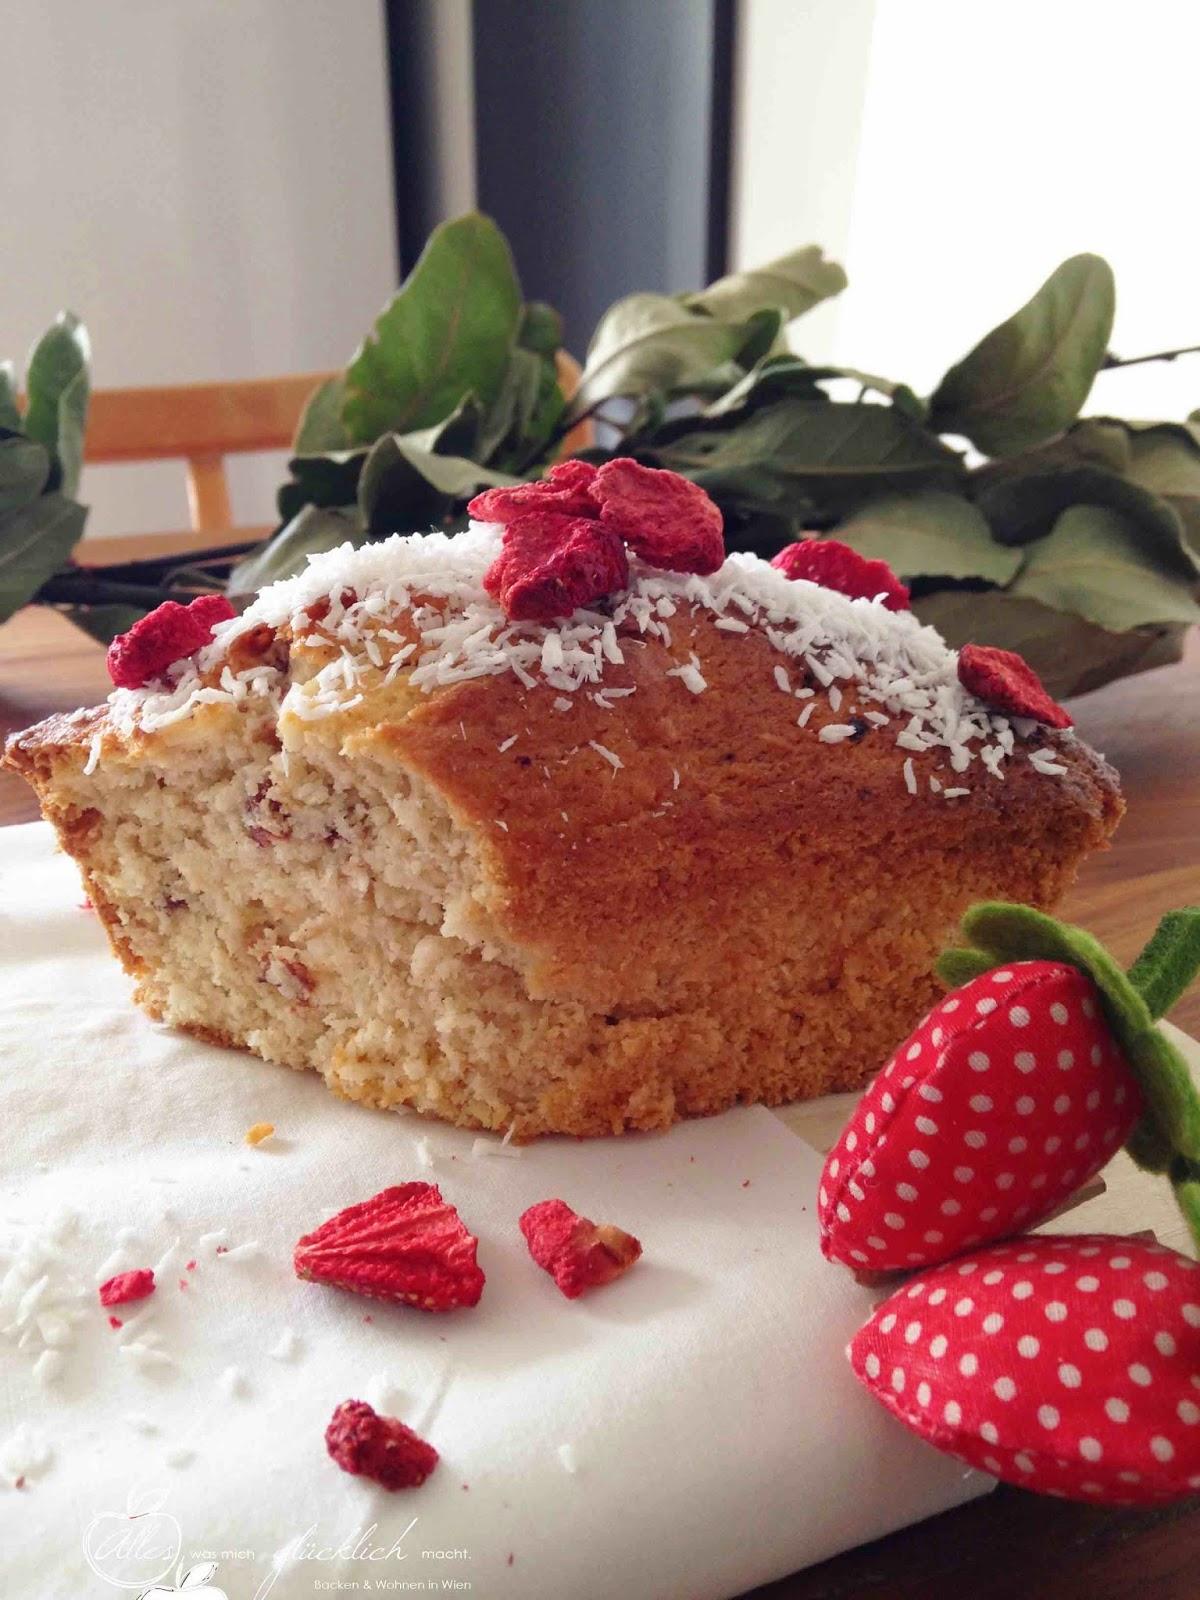 Sommerfeeling im Jänner – Erdbeer-Kokoskuchen mit Birkenzucker – vegan